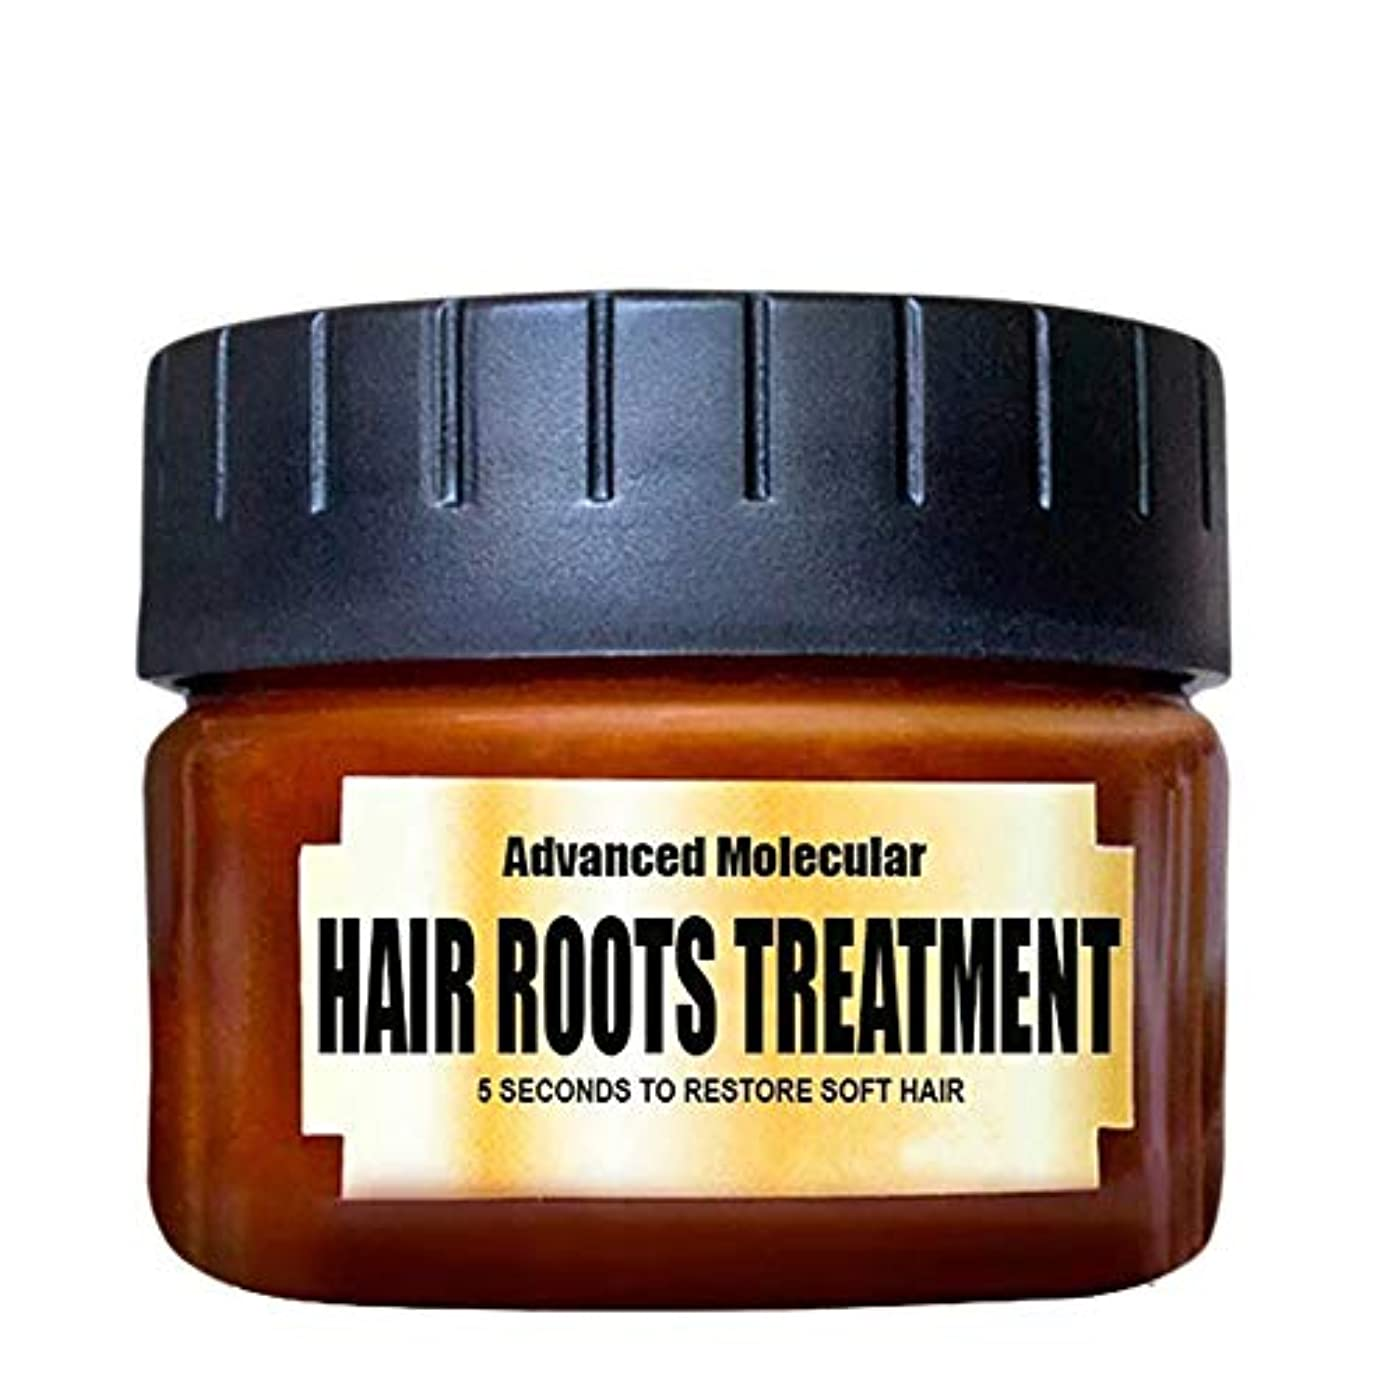 KISSION ヘアマスク 高度な分子毛根治療マスク 天然植物油 ケアヘアエッセンス エッセンス 乾燥した傷んだ髪のためのディープコンディショナー